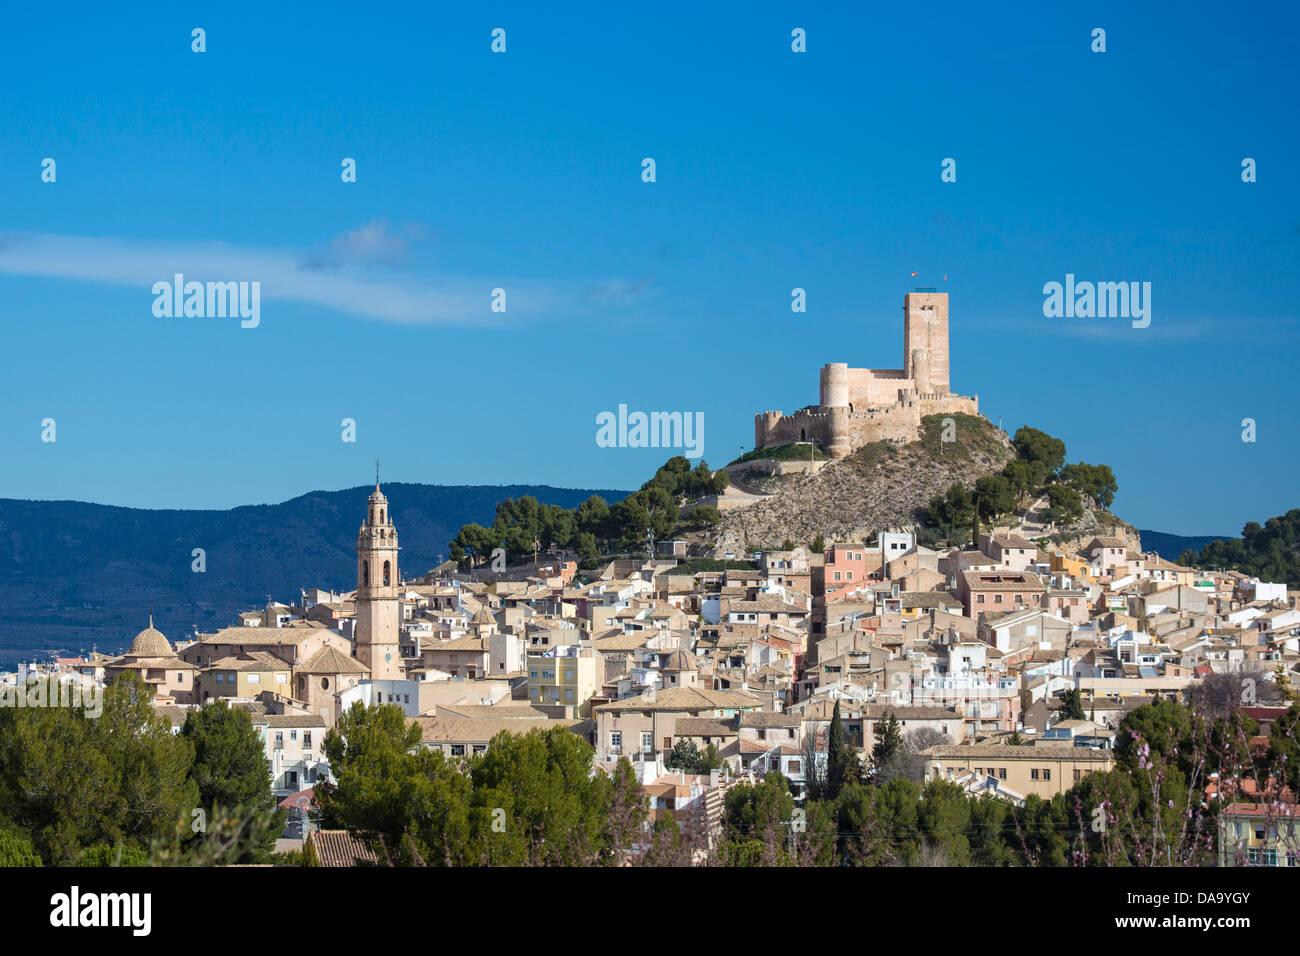 Spain, Europe, Valencia, architecture, buildings, castle, hill, historical, history, pueblo, skyline, touristic, - Stock Image